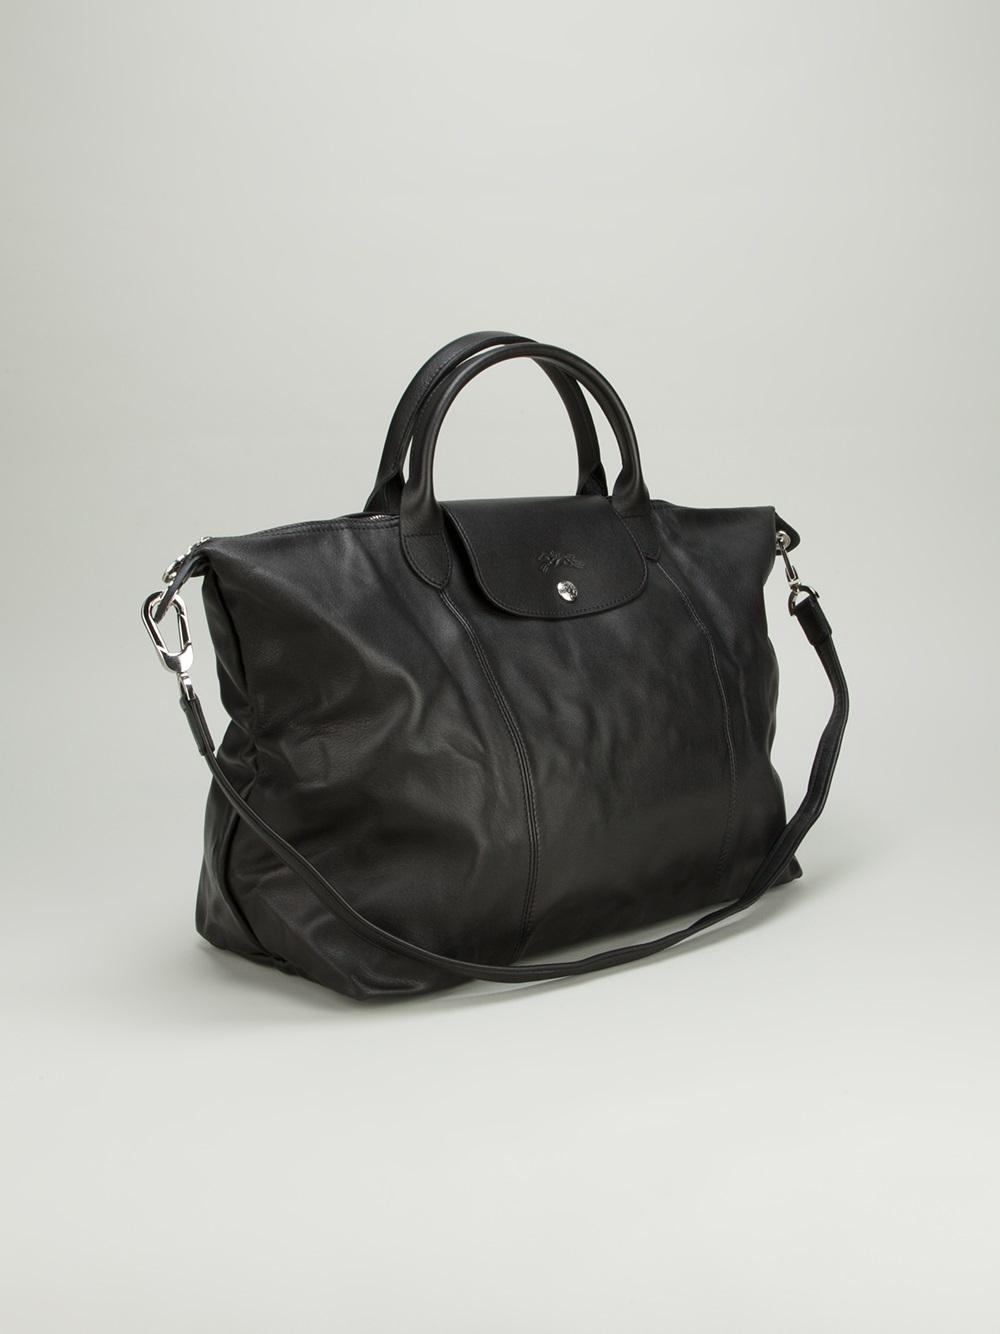 0764a7f49c2 Longchamp Le Pliage Cuir Tote in Black - Lyst